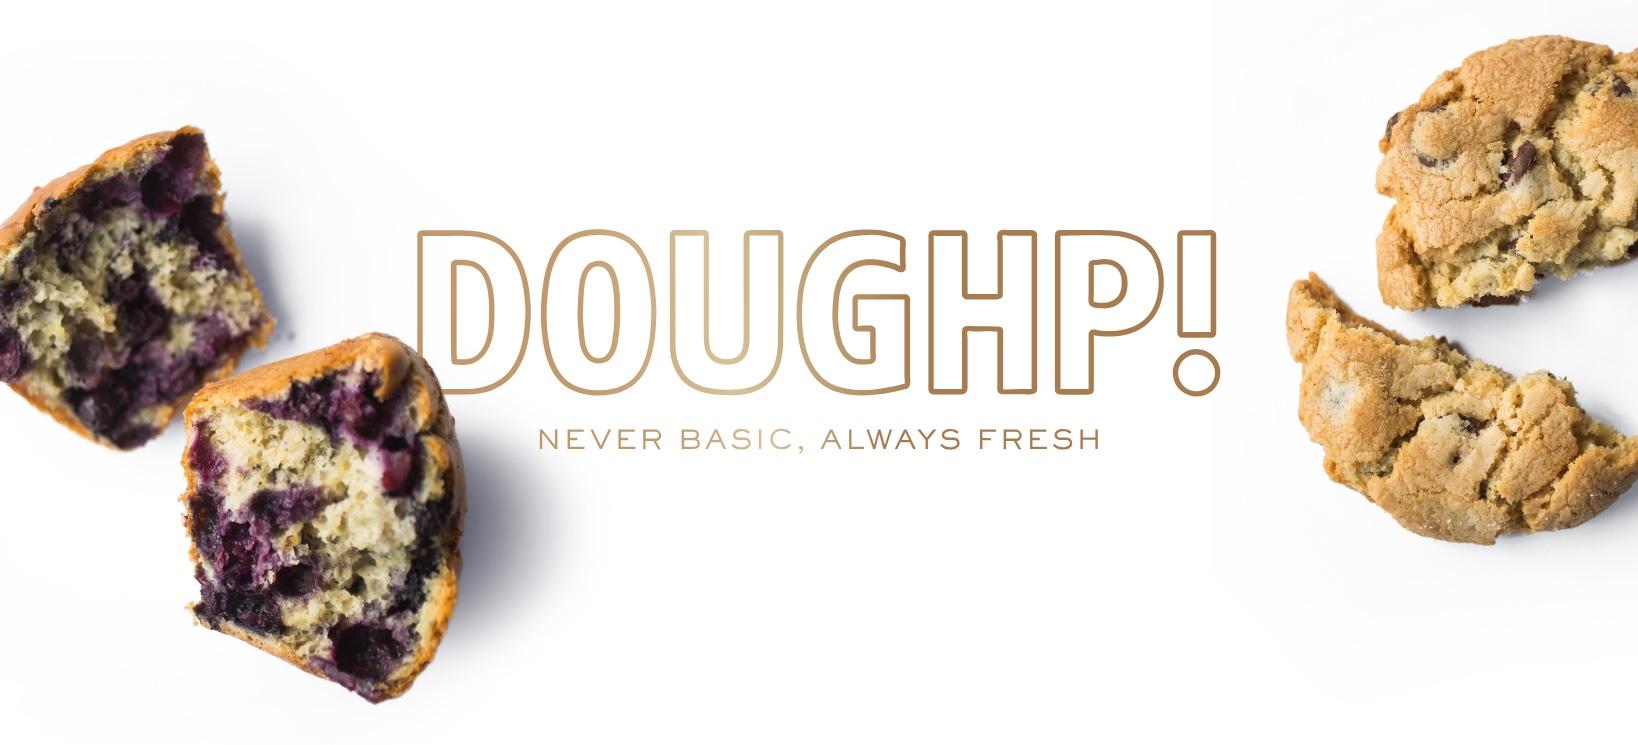 Type-Driven Logo Design And Sleek Branding For Doughp! Bakery